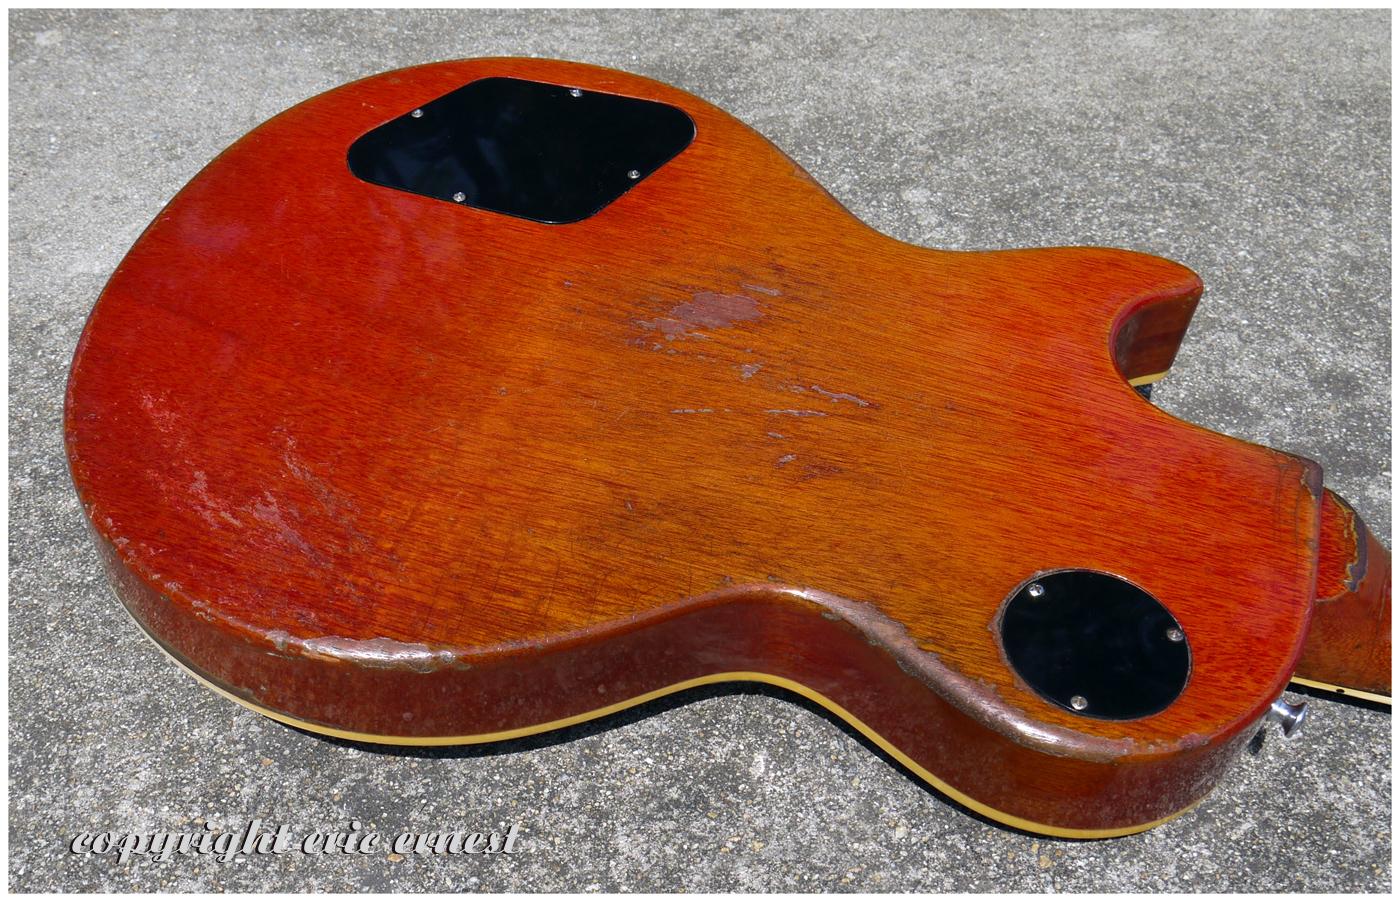 1959 gibson les paul standard guitar guitar collection memphis mojo burst 1958 1960 burst 58 59. Black Bedroom Furniture Sets. Home Design Ideas